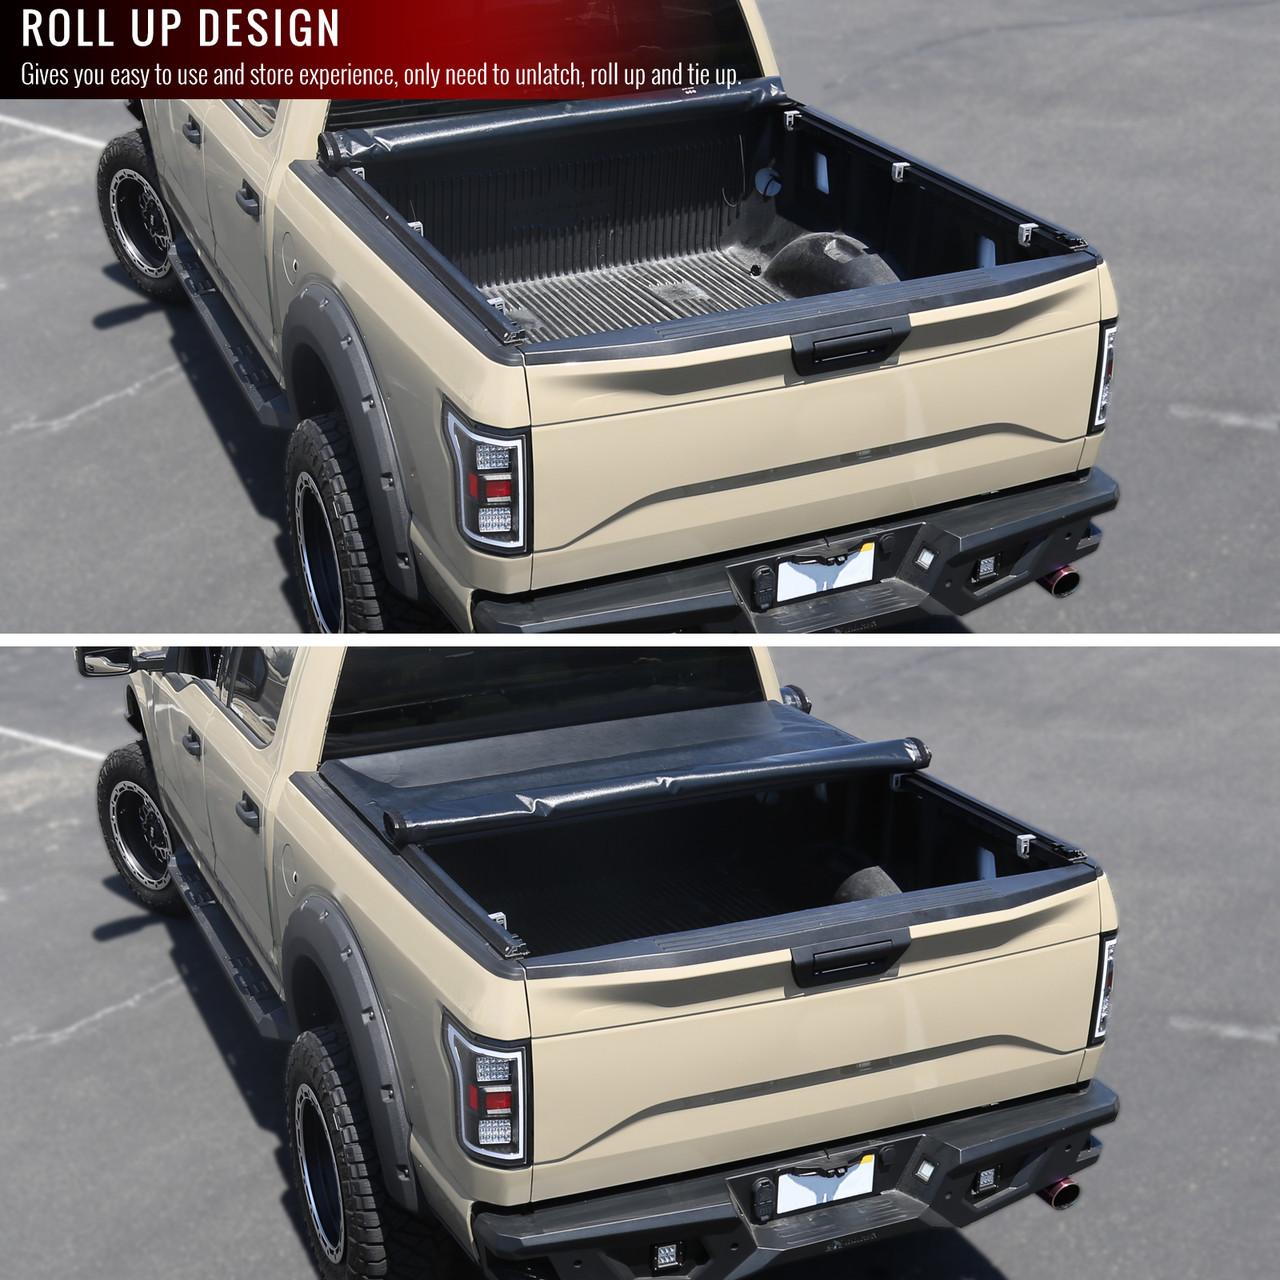 2004 2007 Chevrolet Gmc Silverado Sierra 1500 2500 3500 68 Bed Vinyl Tonneau Cover K2 Motor